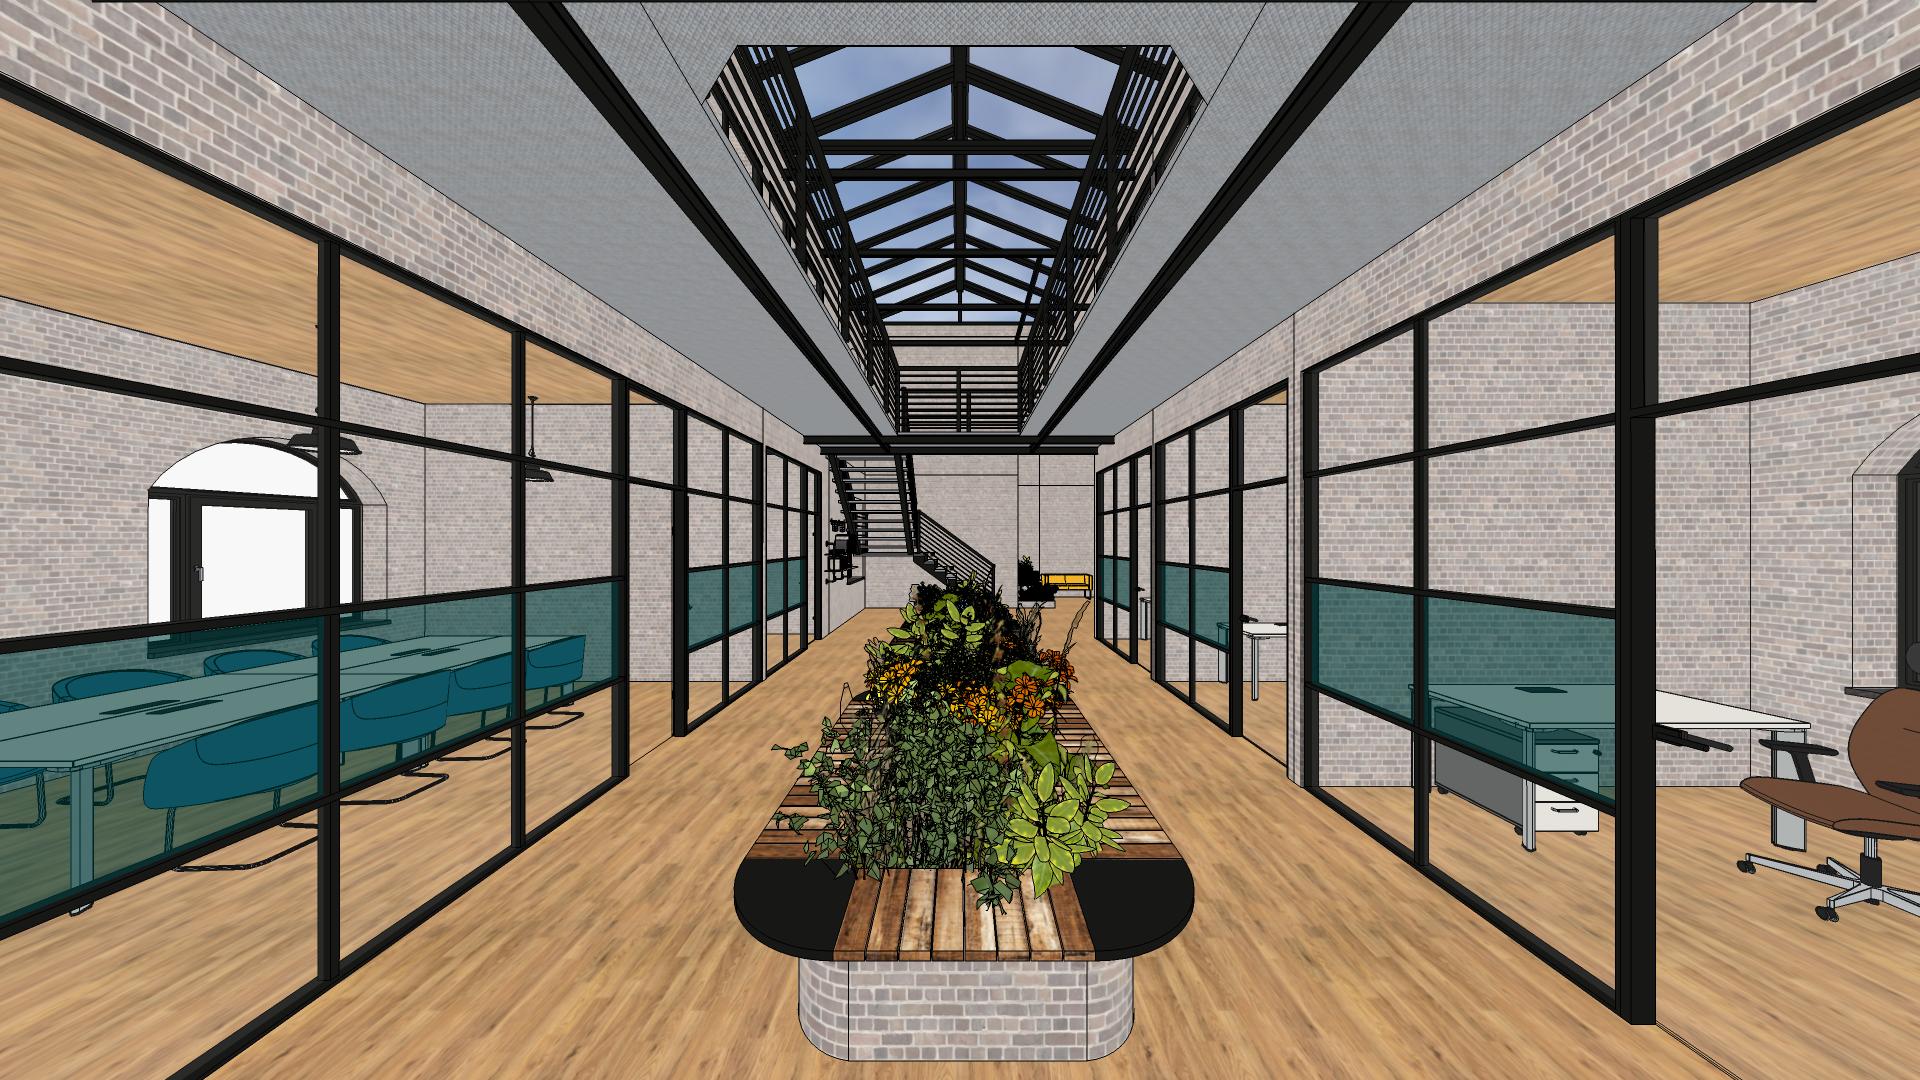 Bürogebäude im Industrial Style